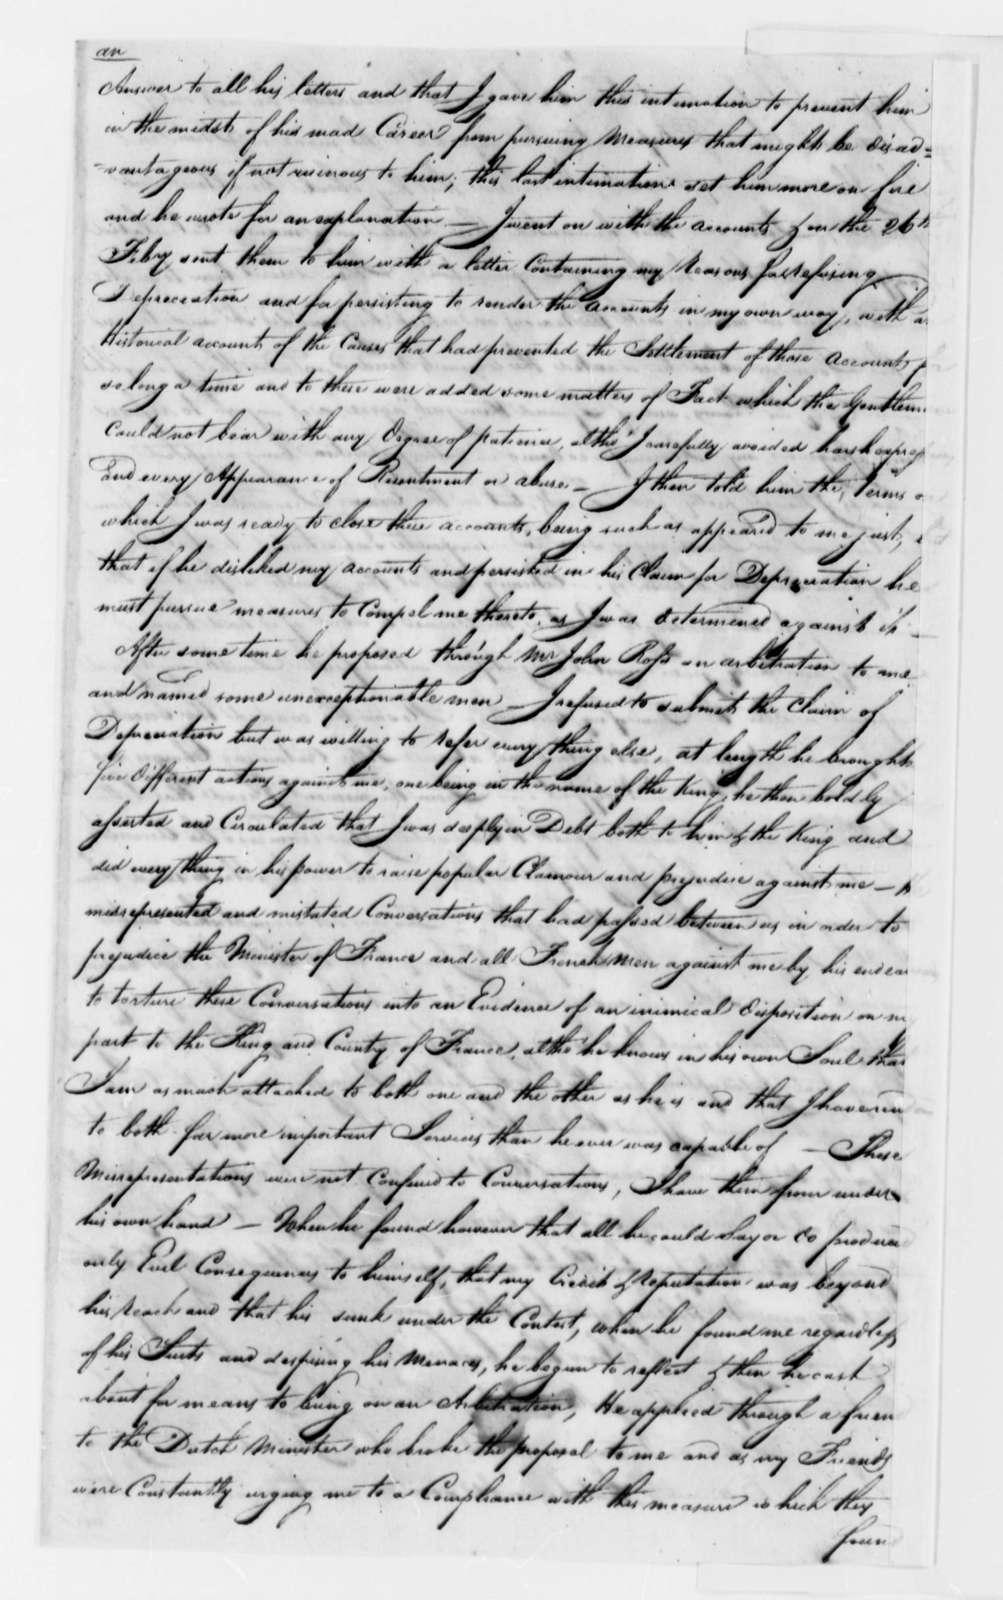 Robert Morris to John Rucker, June 14, 1784